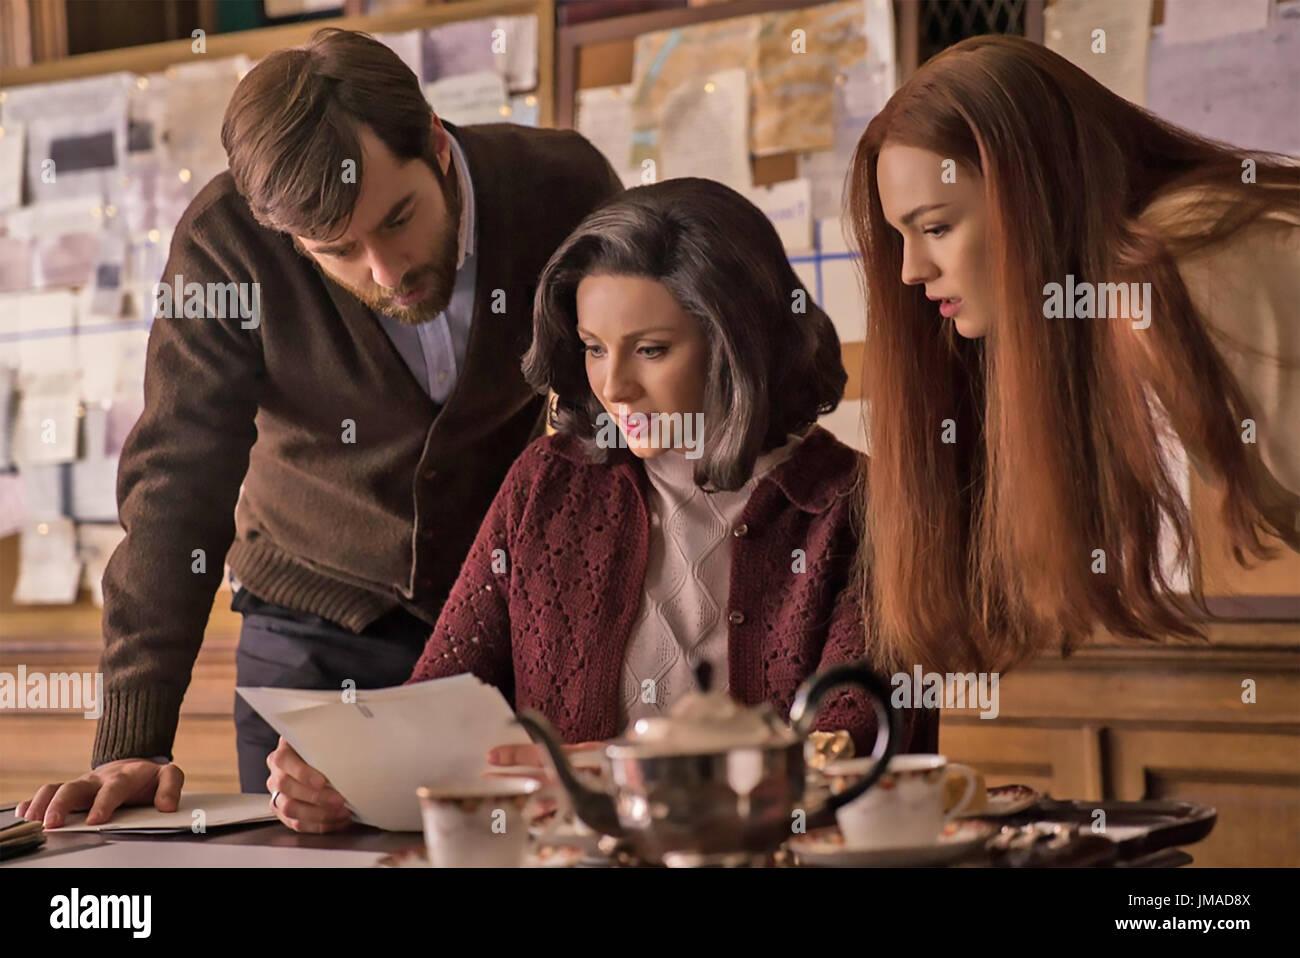 OUTLANDER Tall Ship TV series 2014> with from left: Richard Rankin, Caitriona Balfe, Sophie Skelton - Stock Image